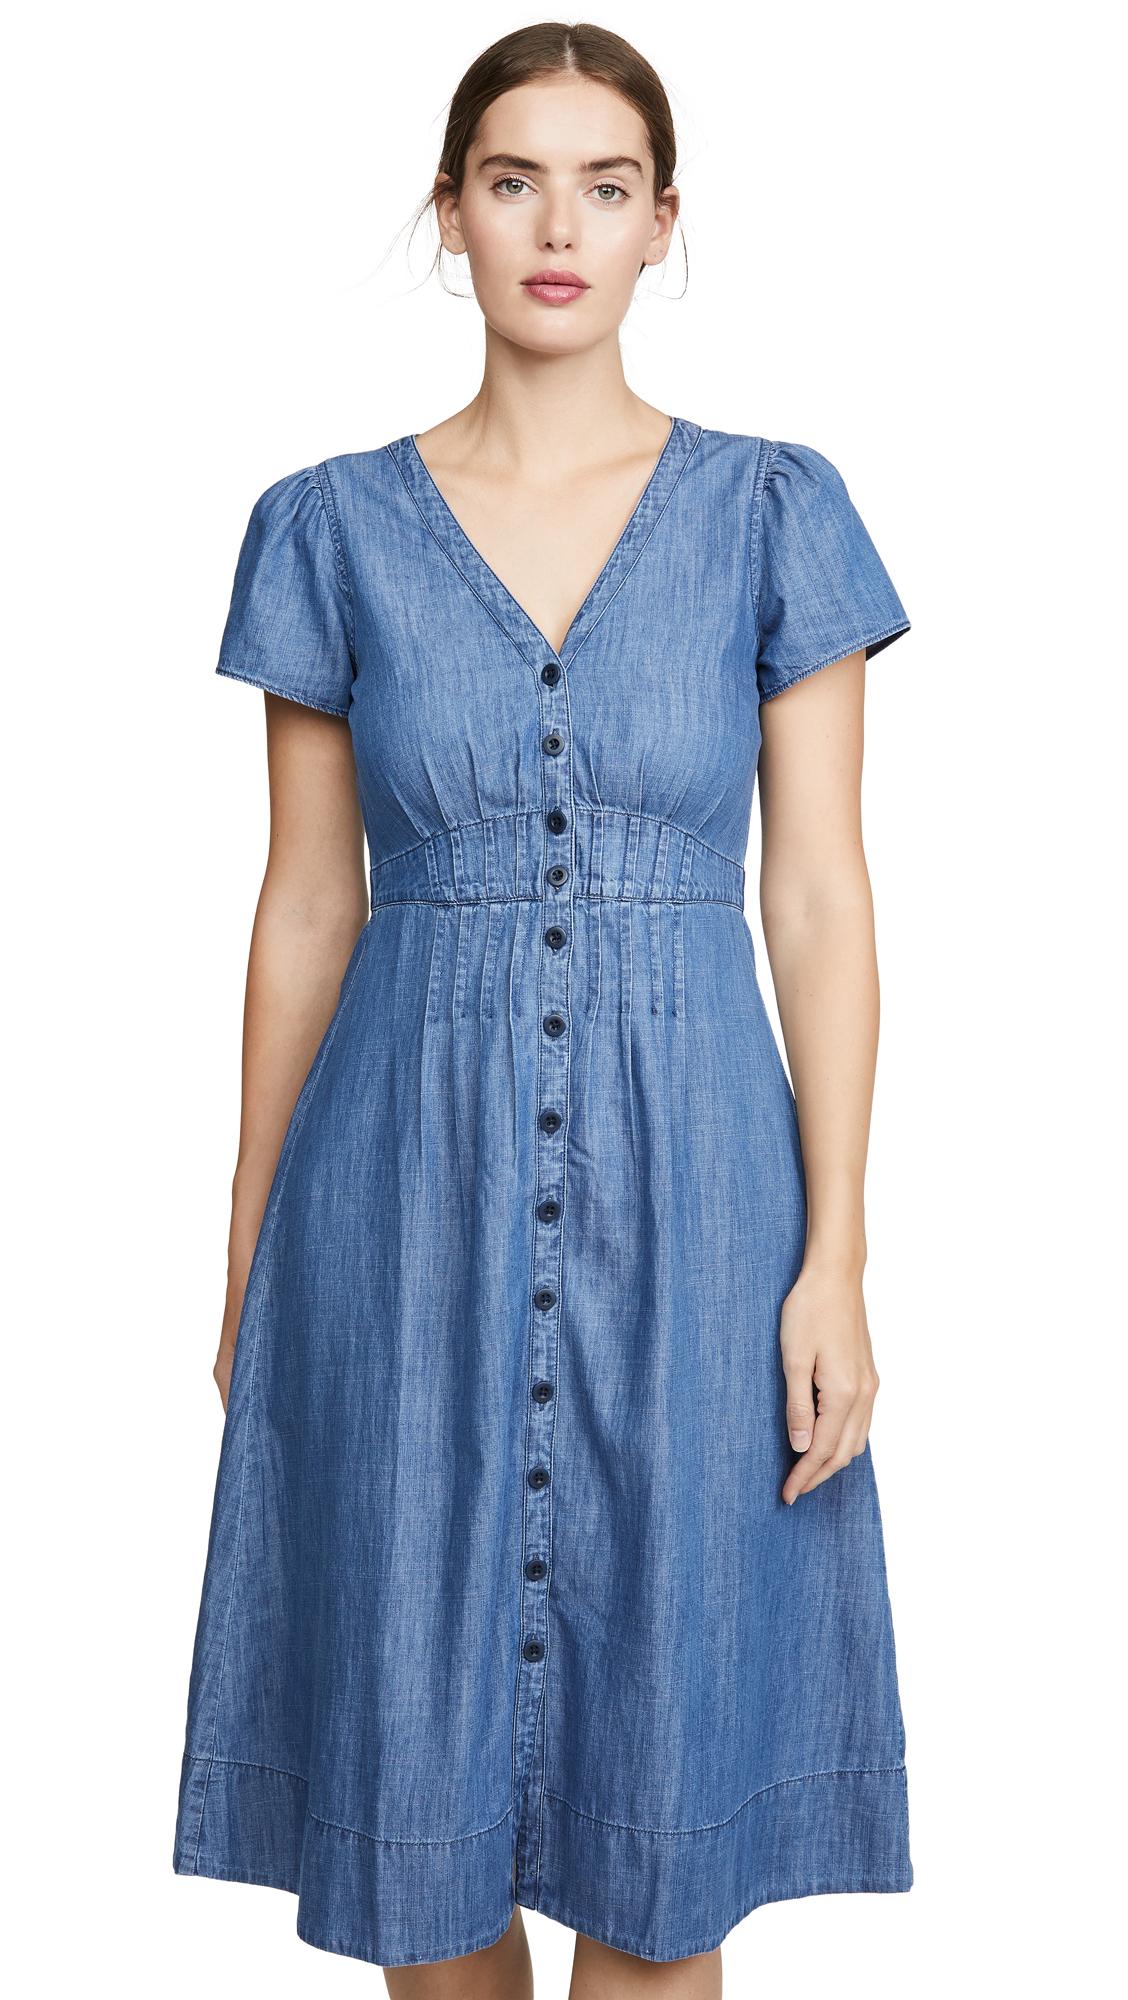 Madewell Denim Melody Dress - 70% Off Sale